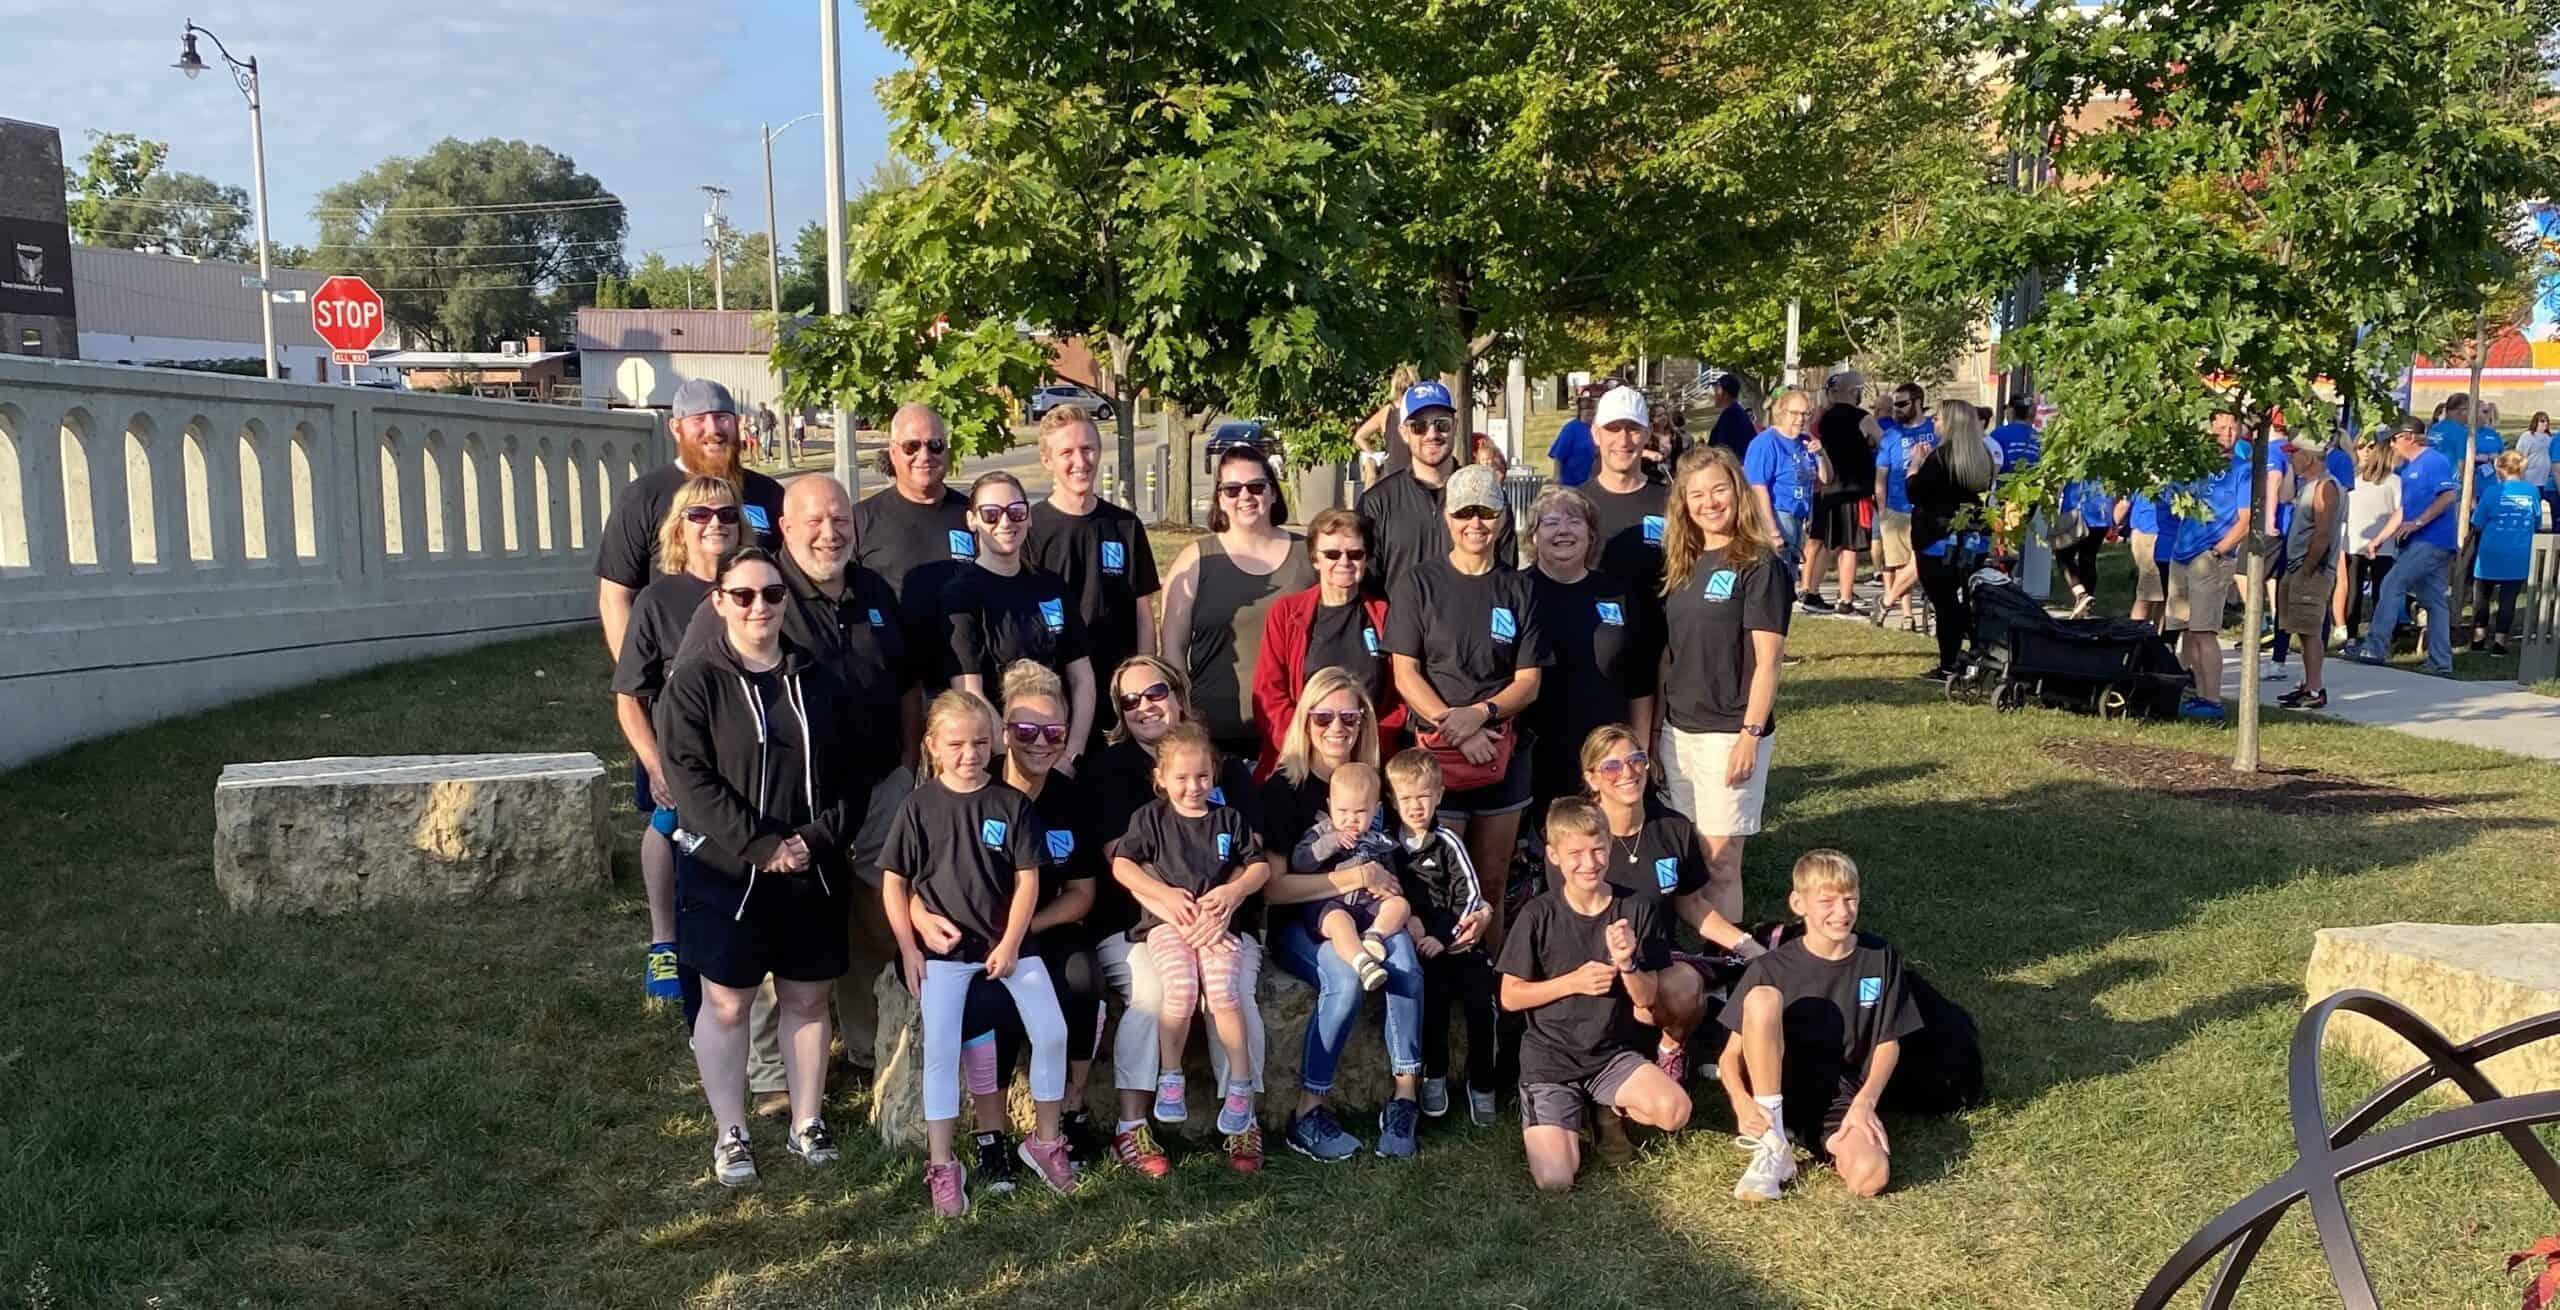 Nowlan Law Participates in the 2021 Bert Blain Memorial Heart Walk